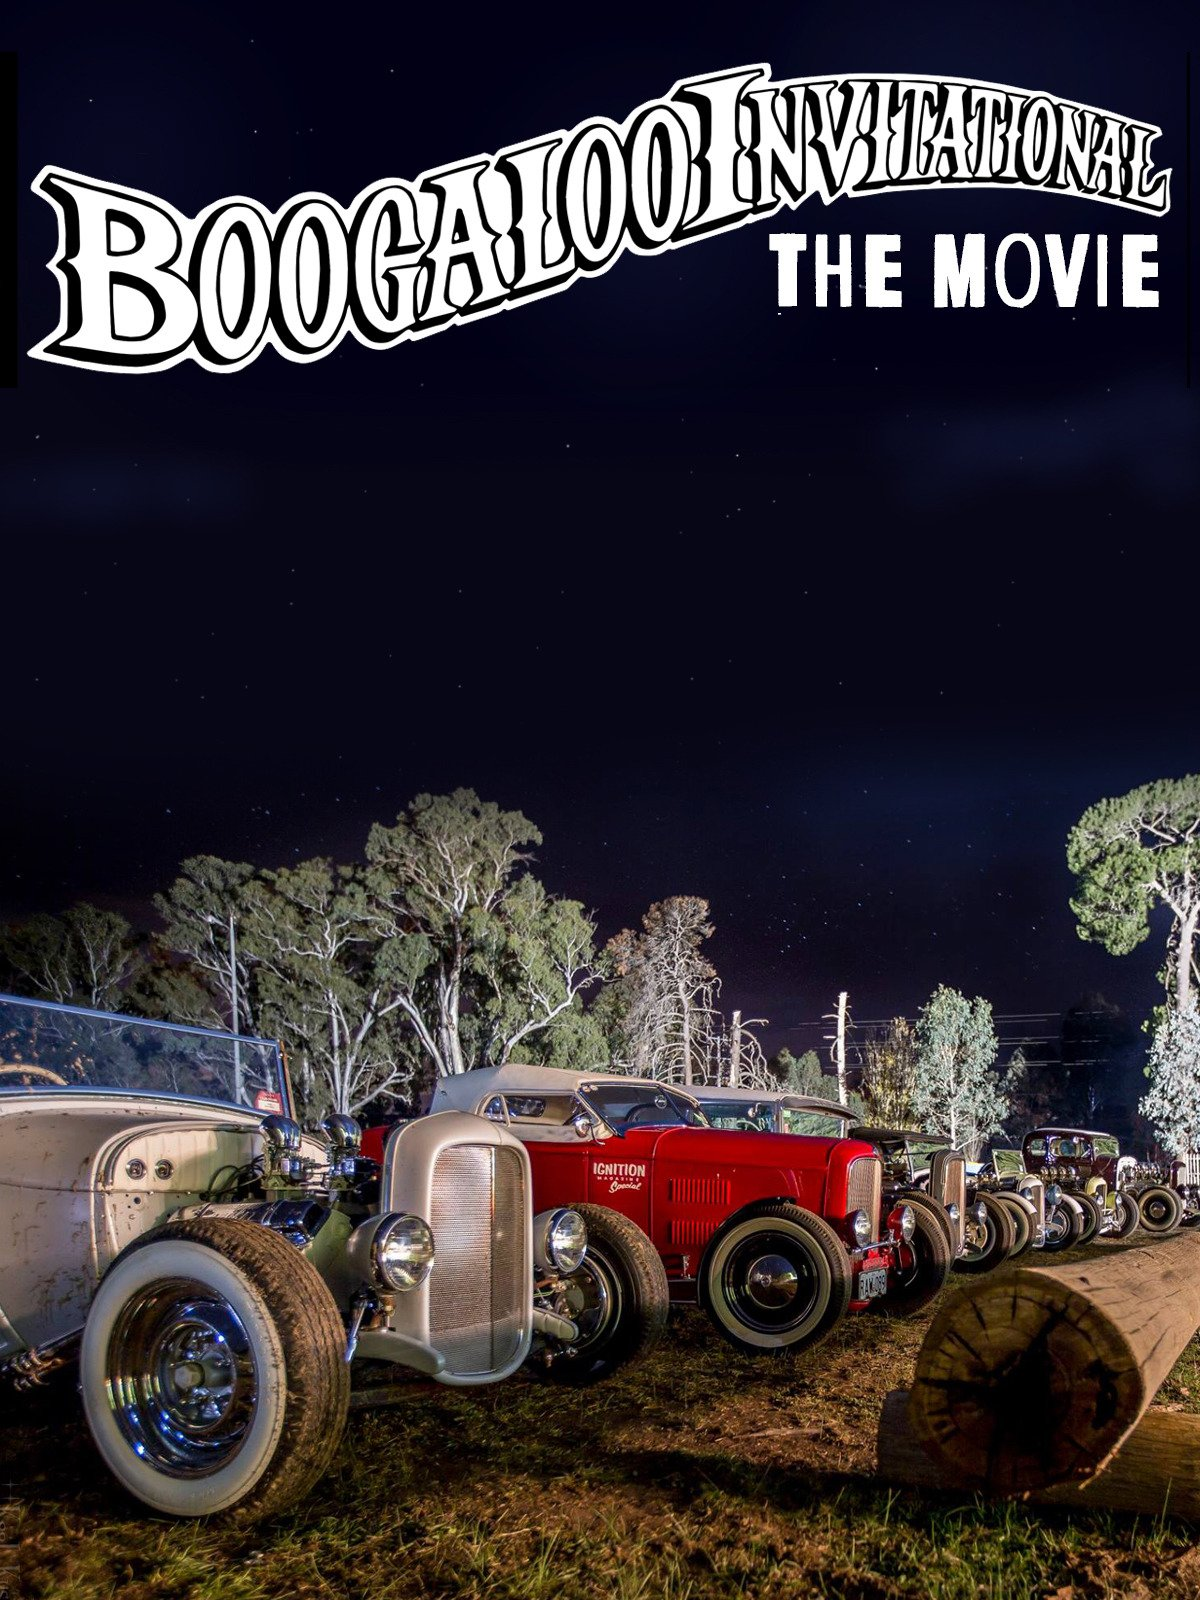 Boogaloo Invitational The Movie